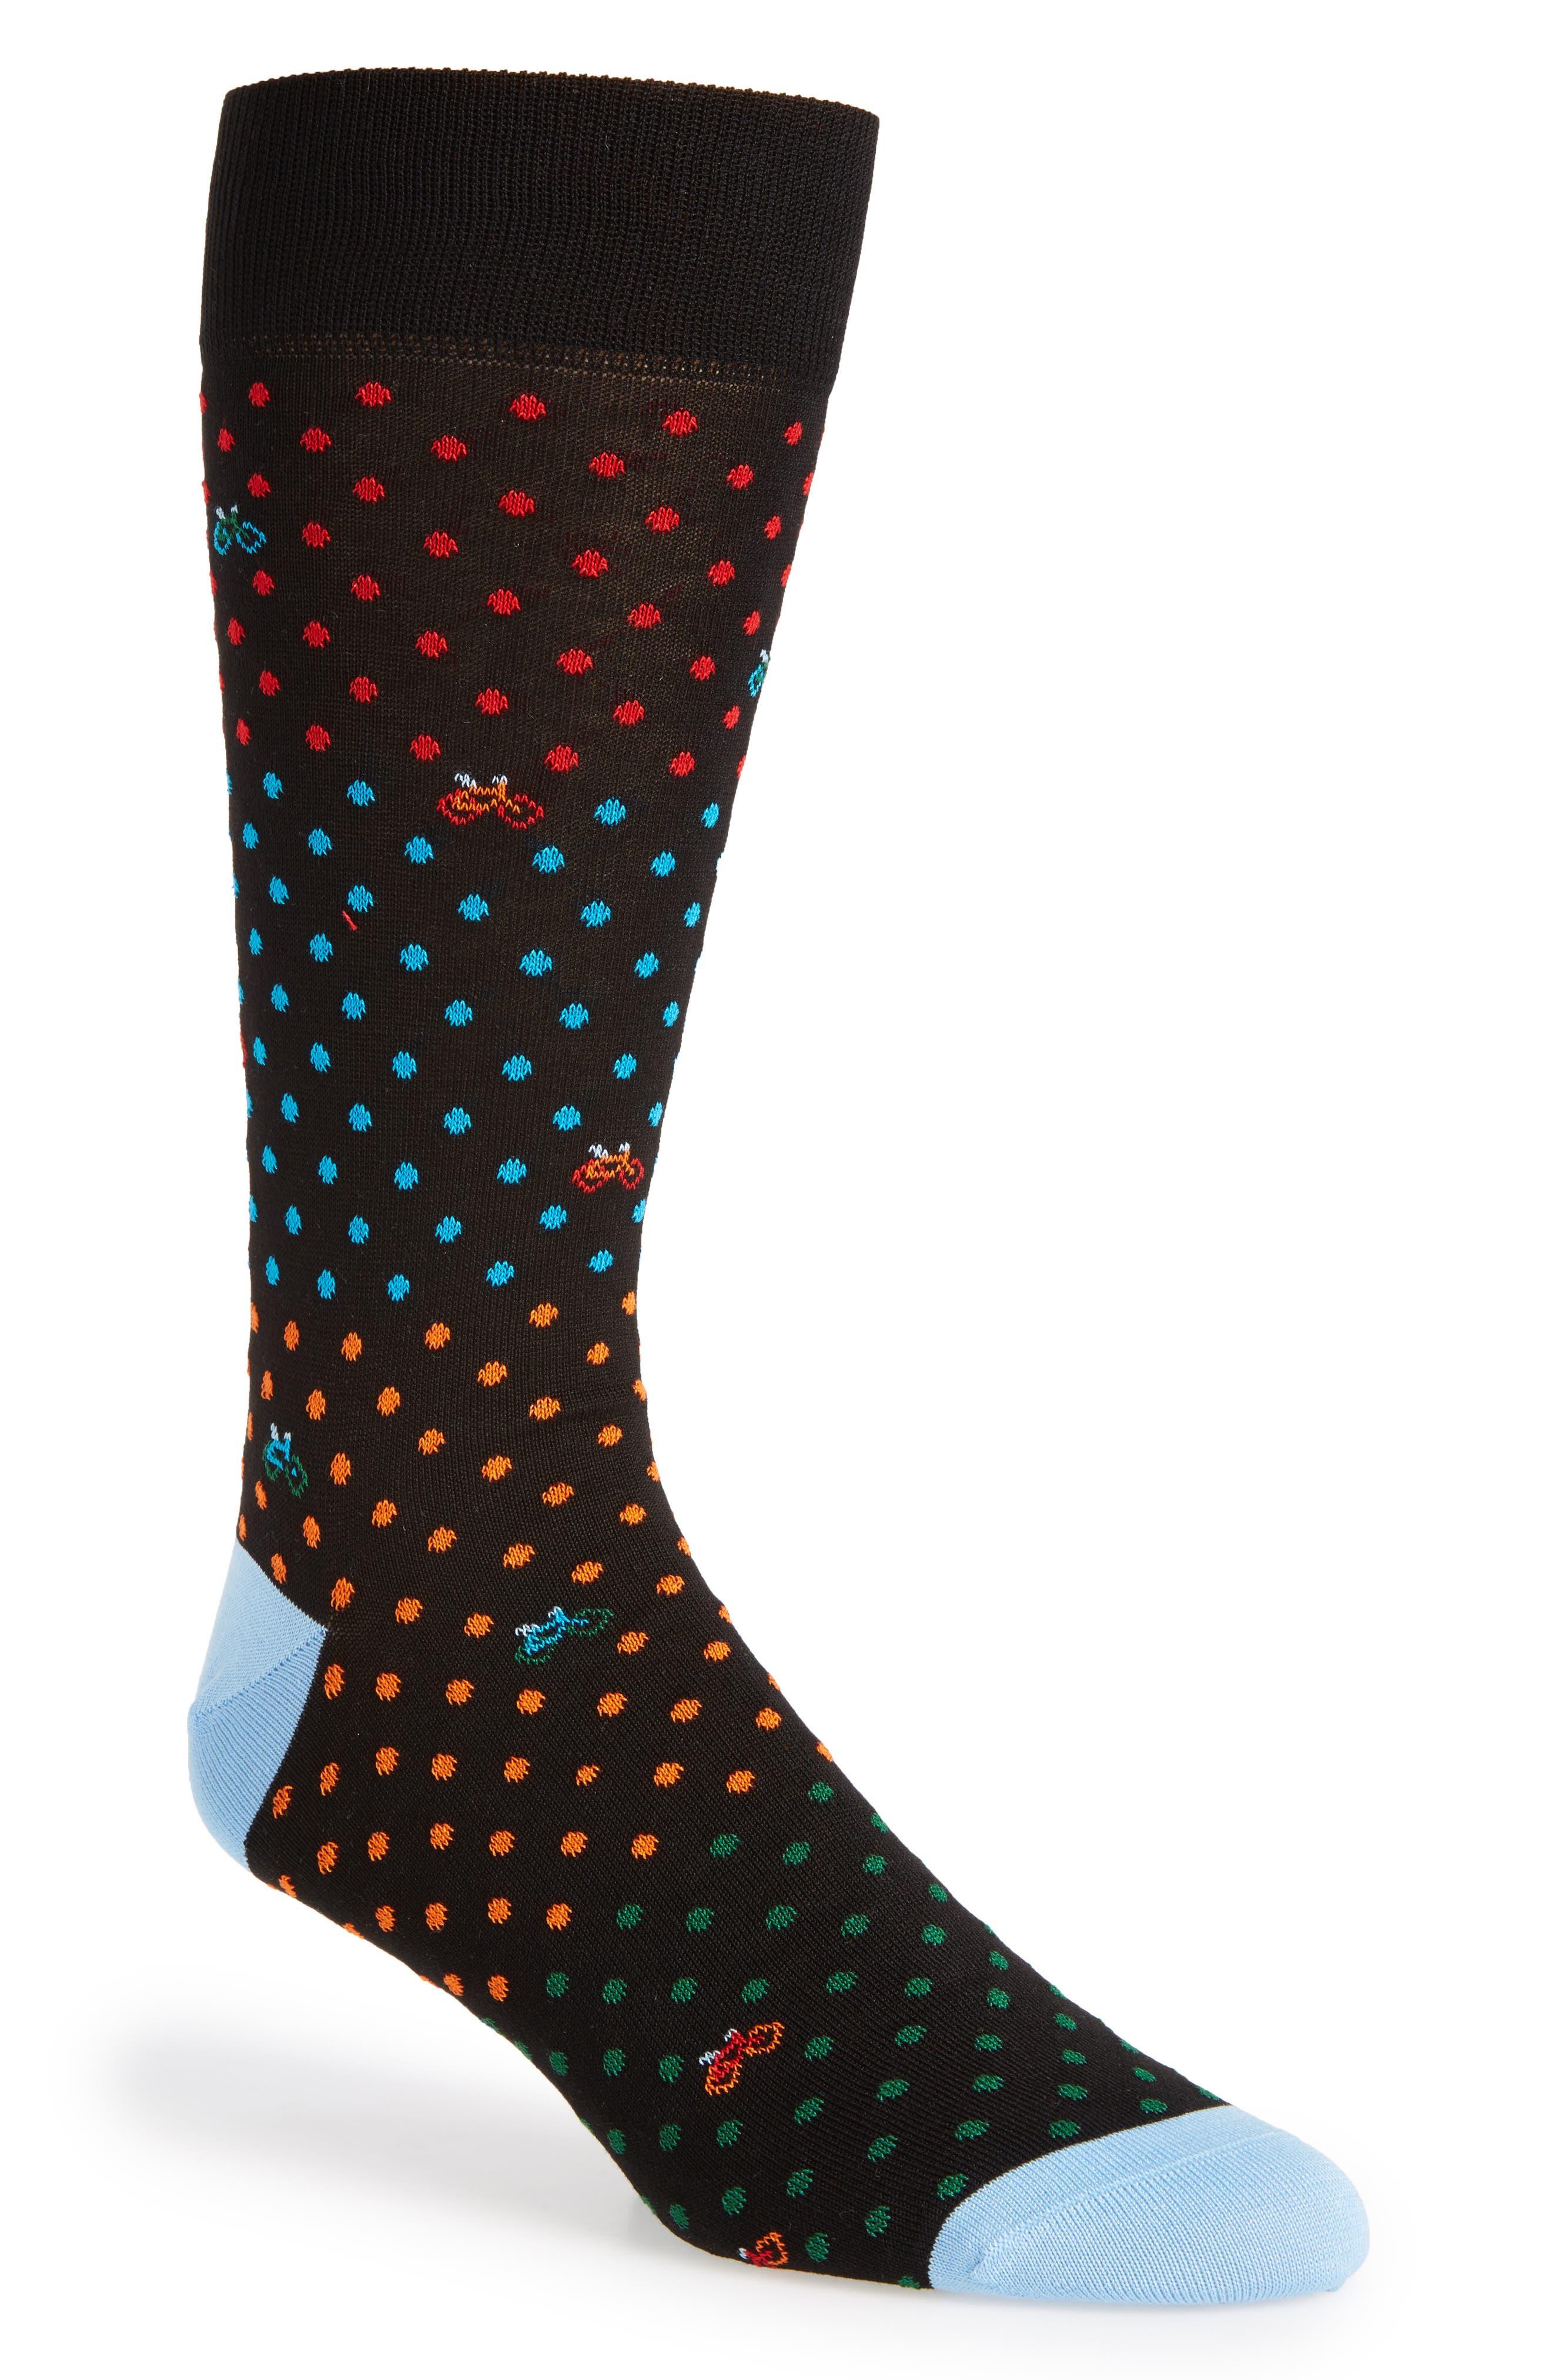 Dot Bike Socks,                         Main,                         color, 001